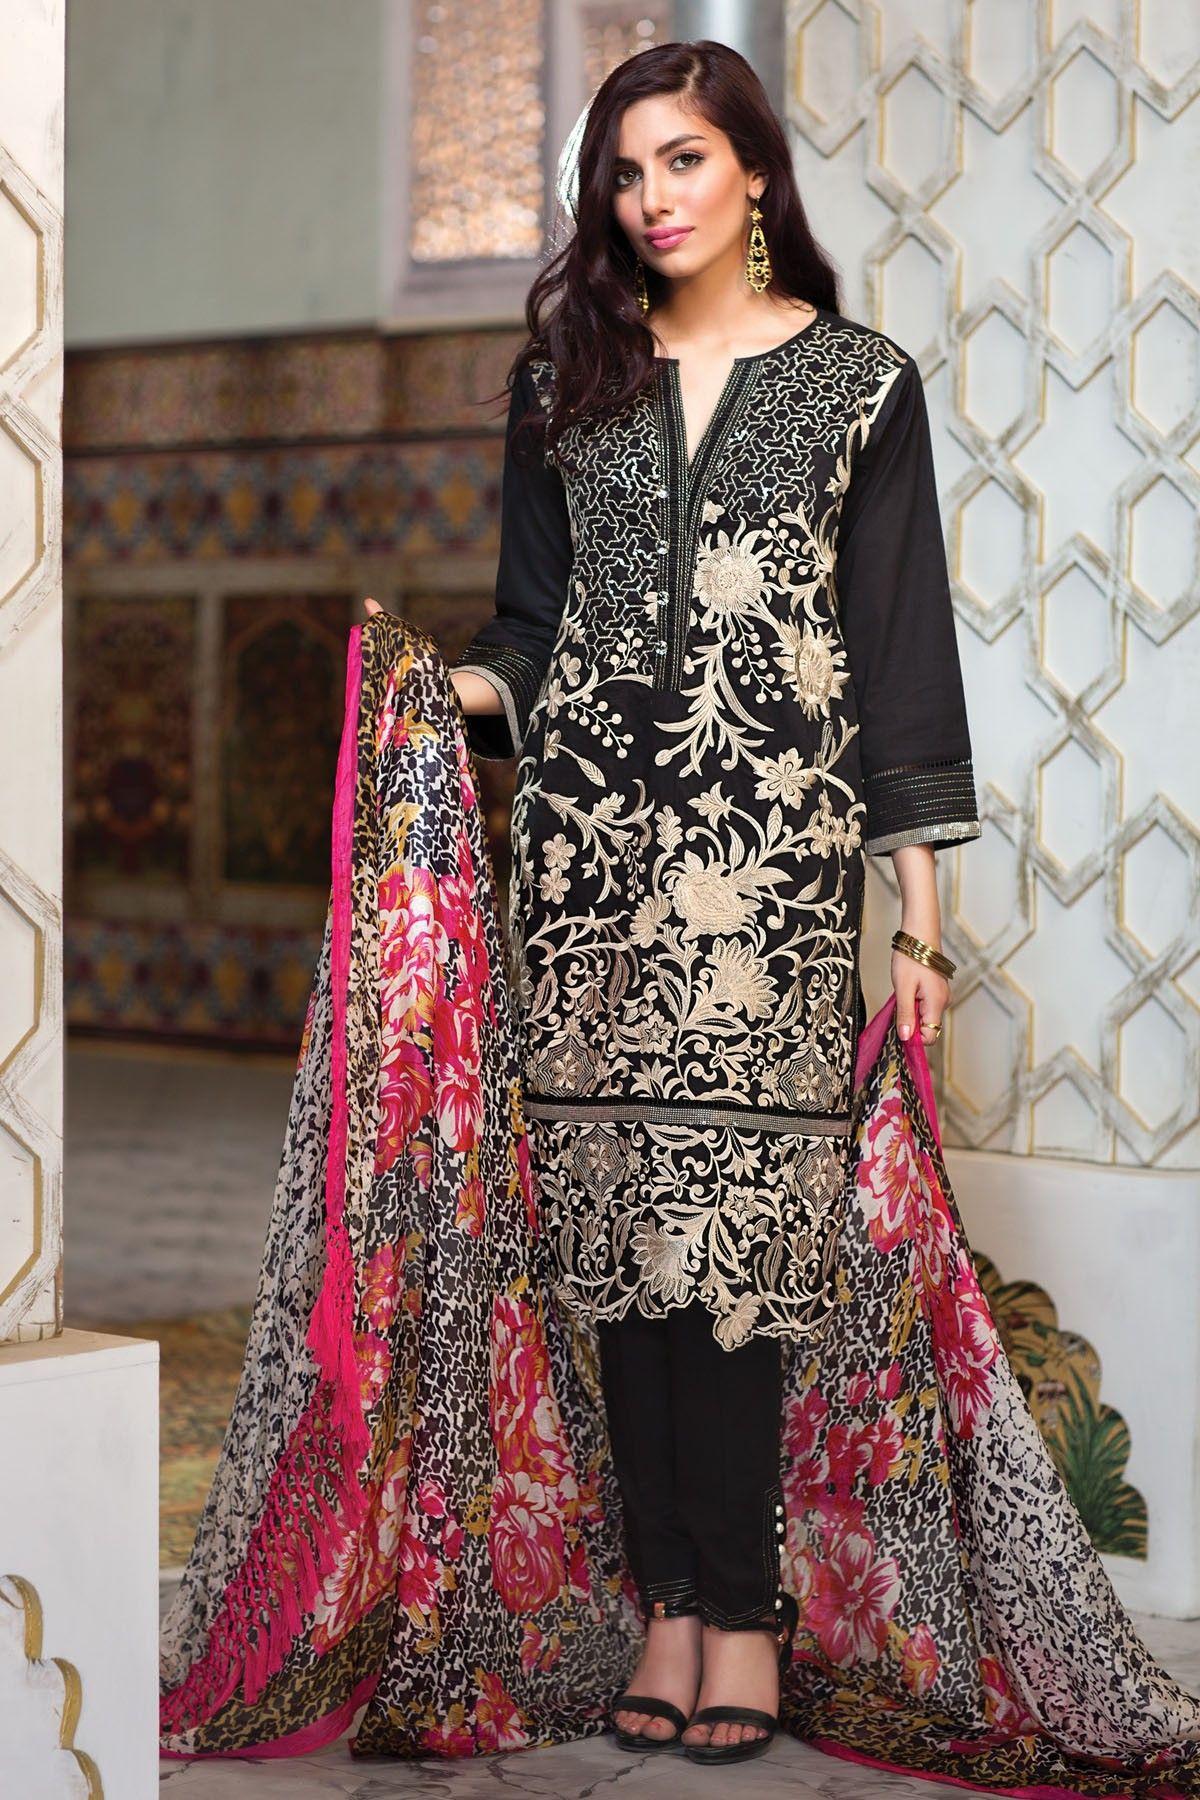 1481c9da2 Khaadi Lawn Chiffon Eid Dresses Designs Collection 2018-2019 ...